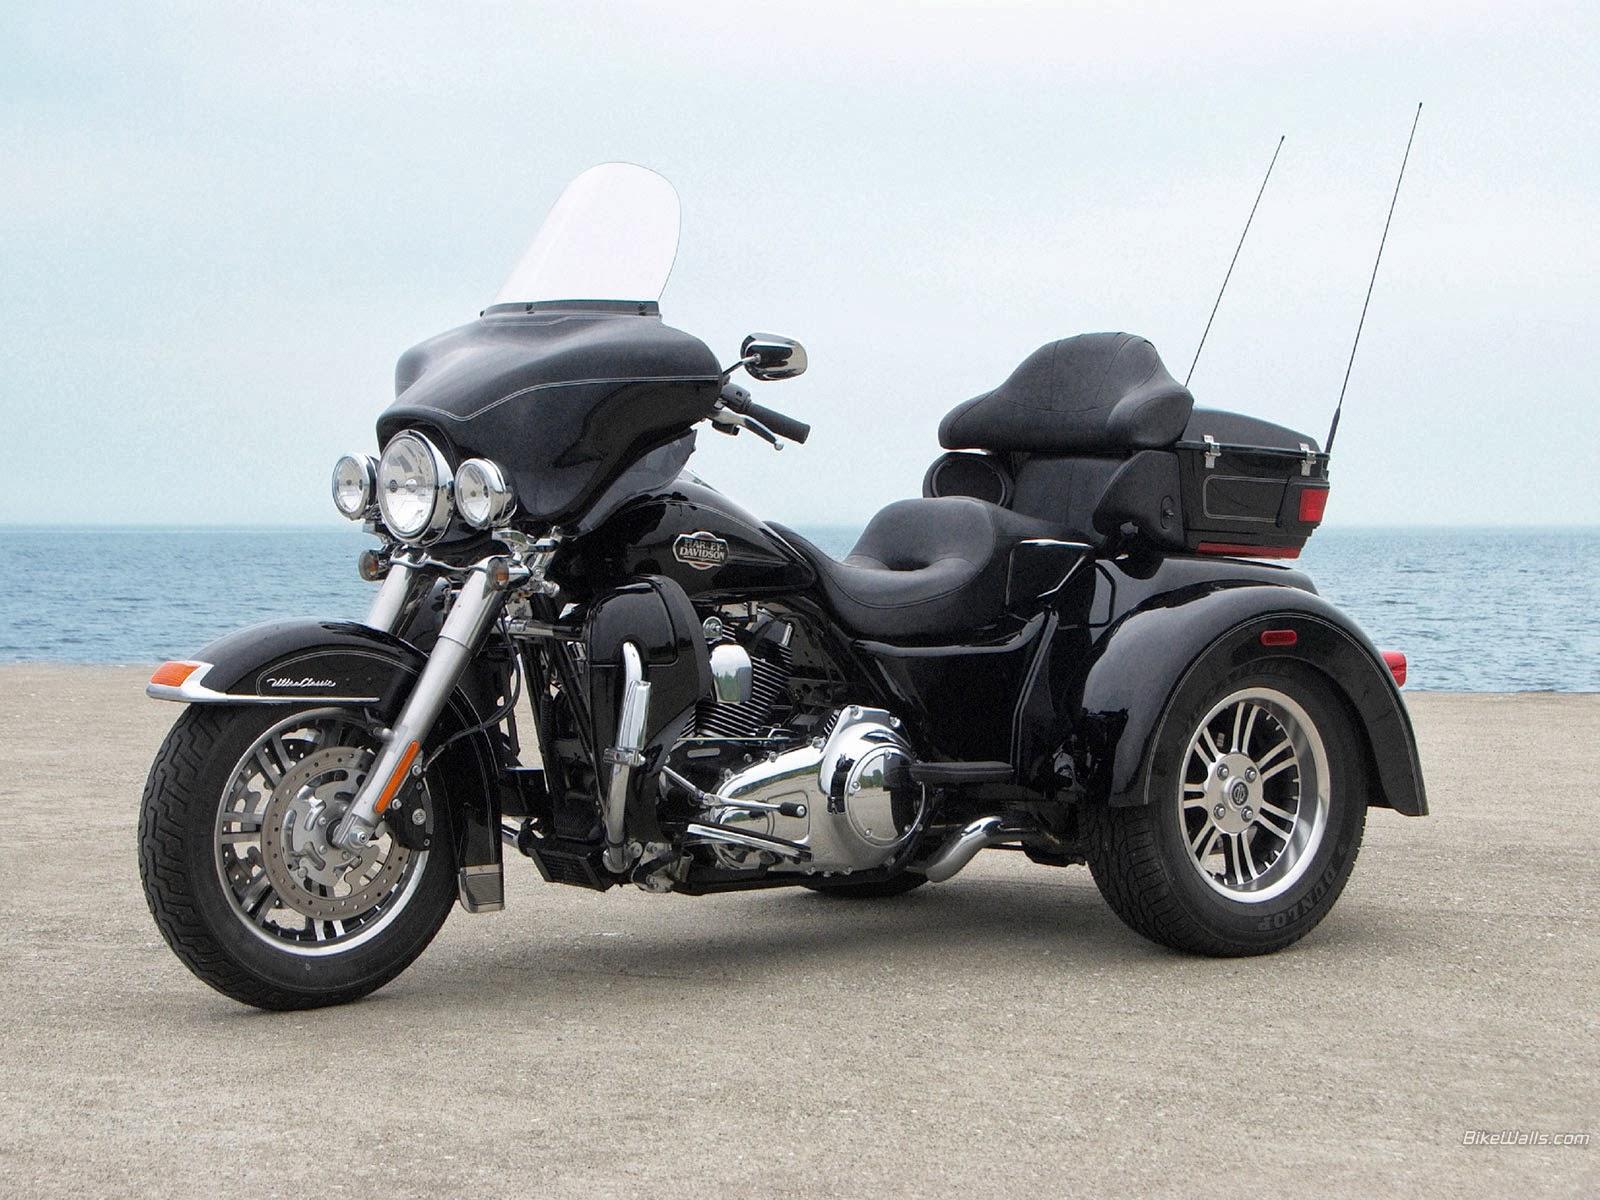 Harley Davidson TRI Glide - Harley Davidson Motor